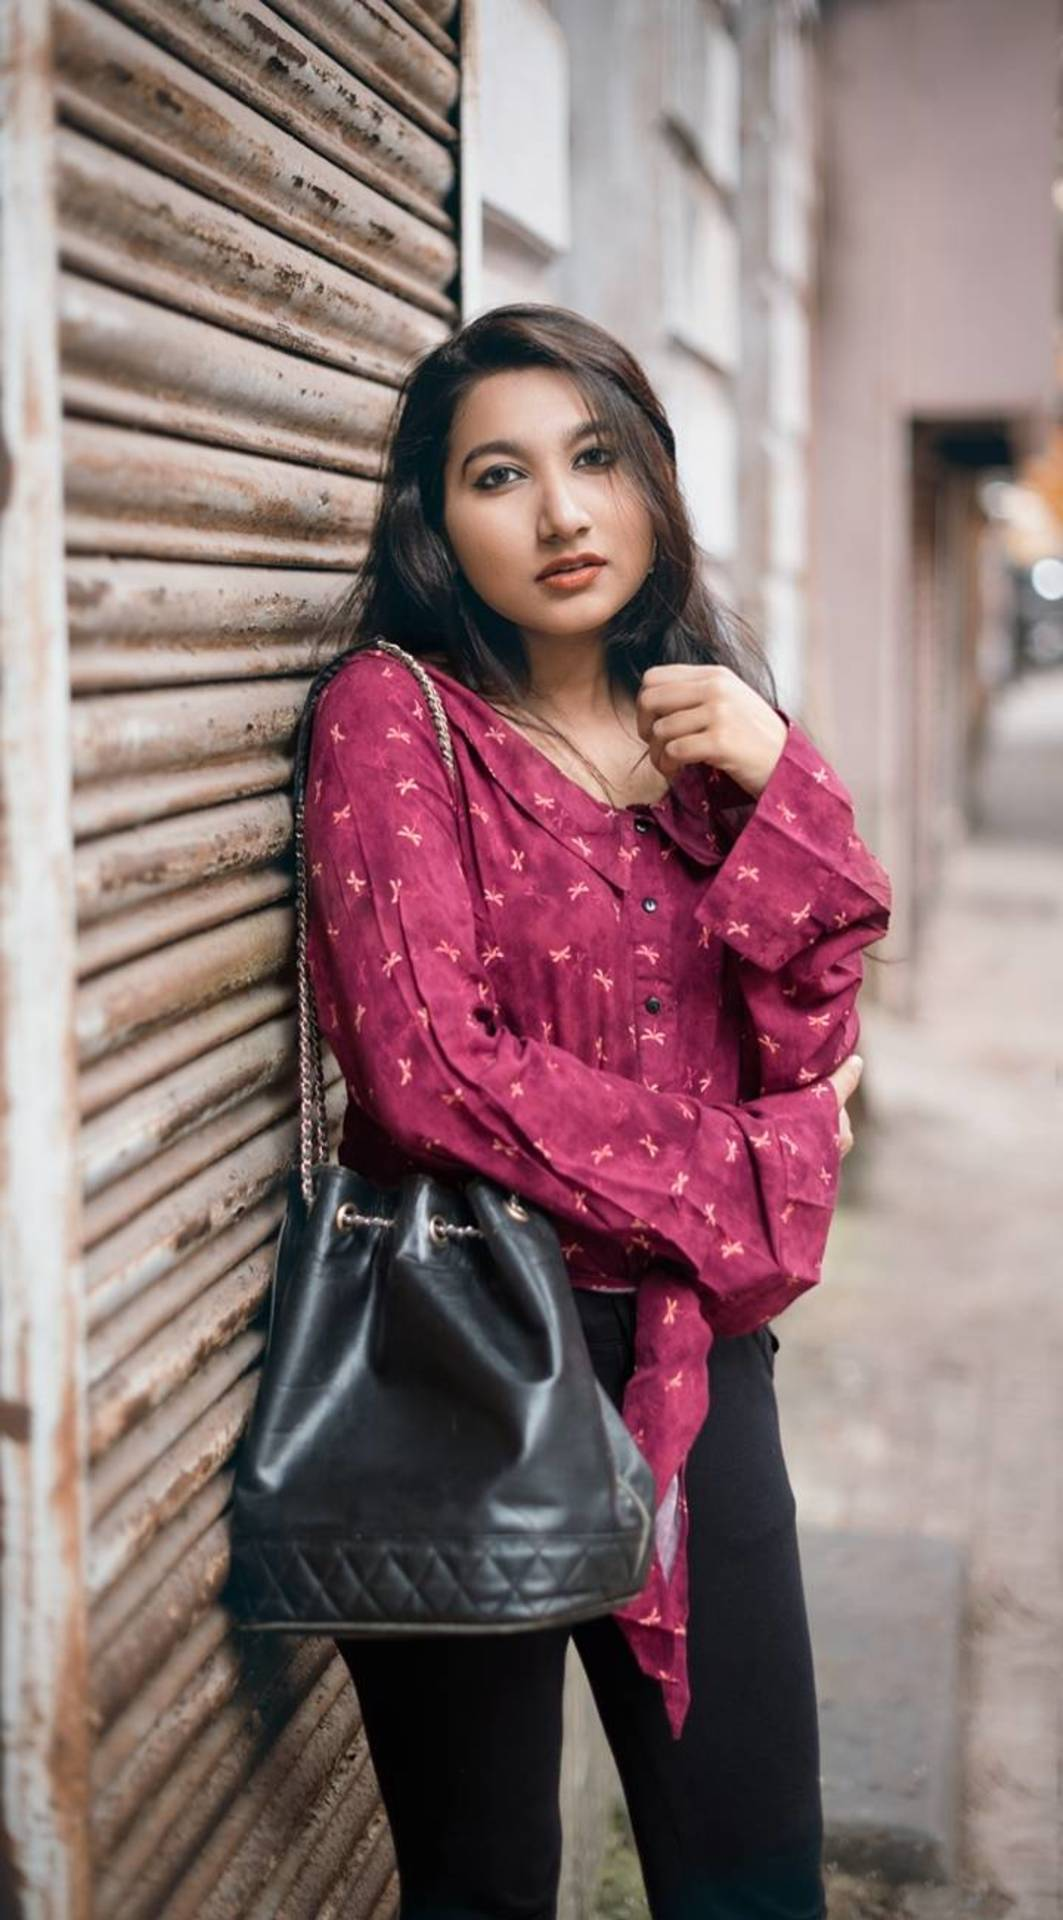 The mixed bag - BeautyPlus_20181010001910_save